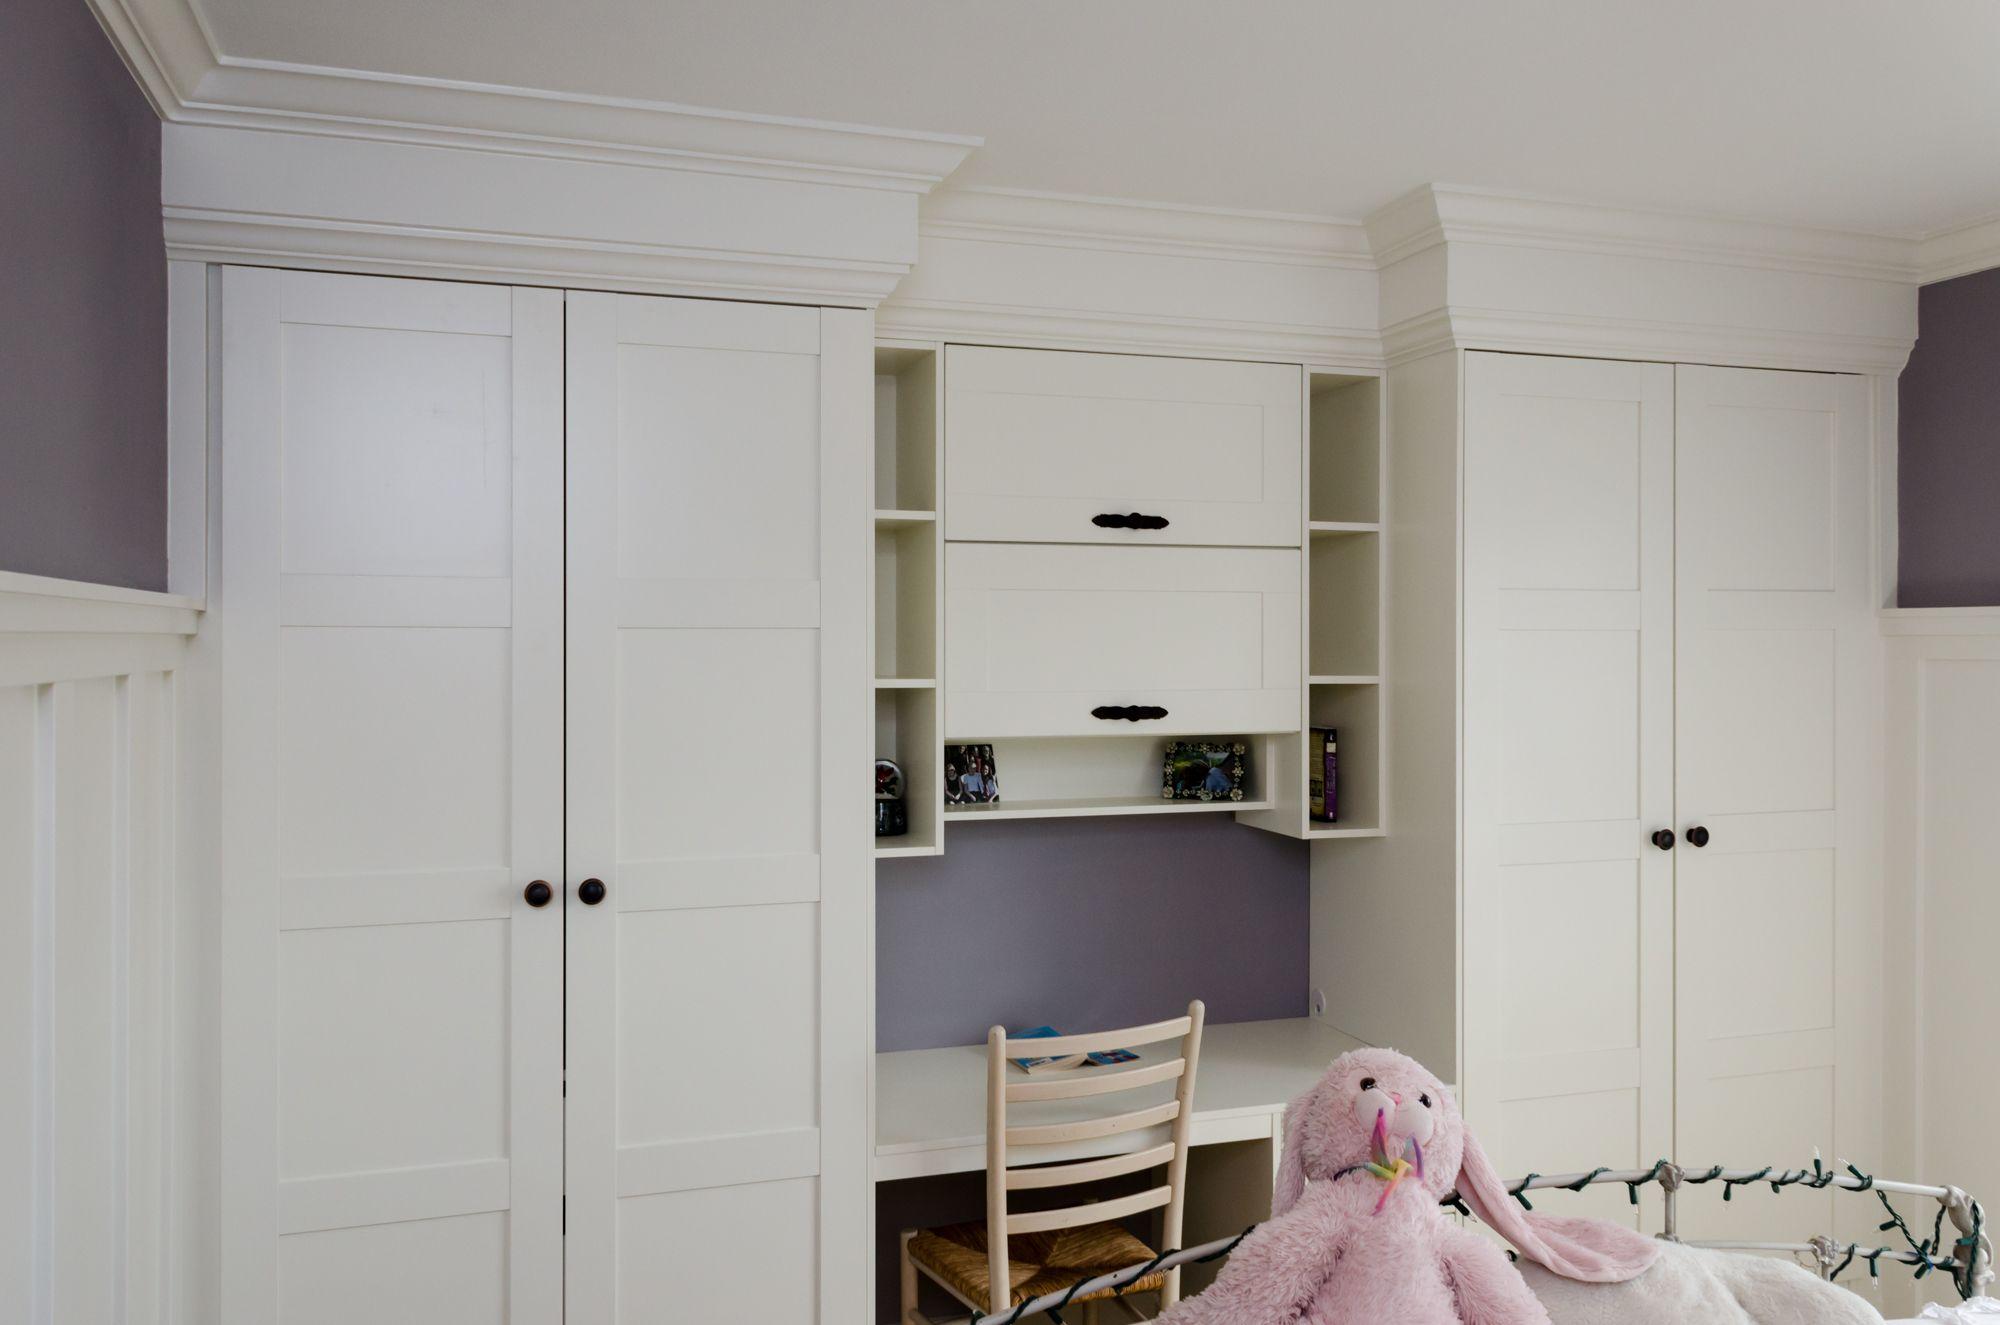 Working With IKEA's PAX Wardrobe Units Closet Design